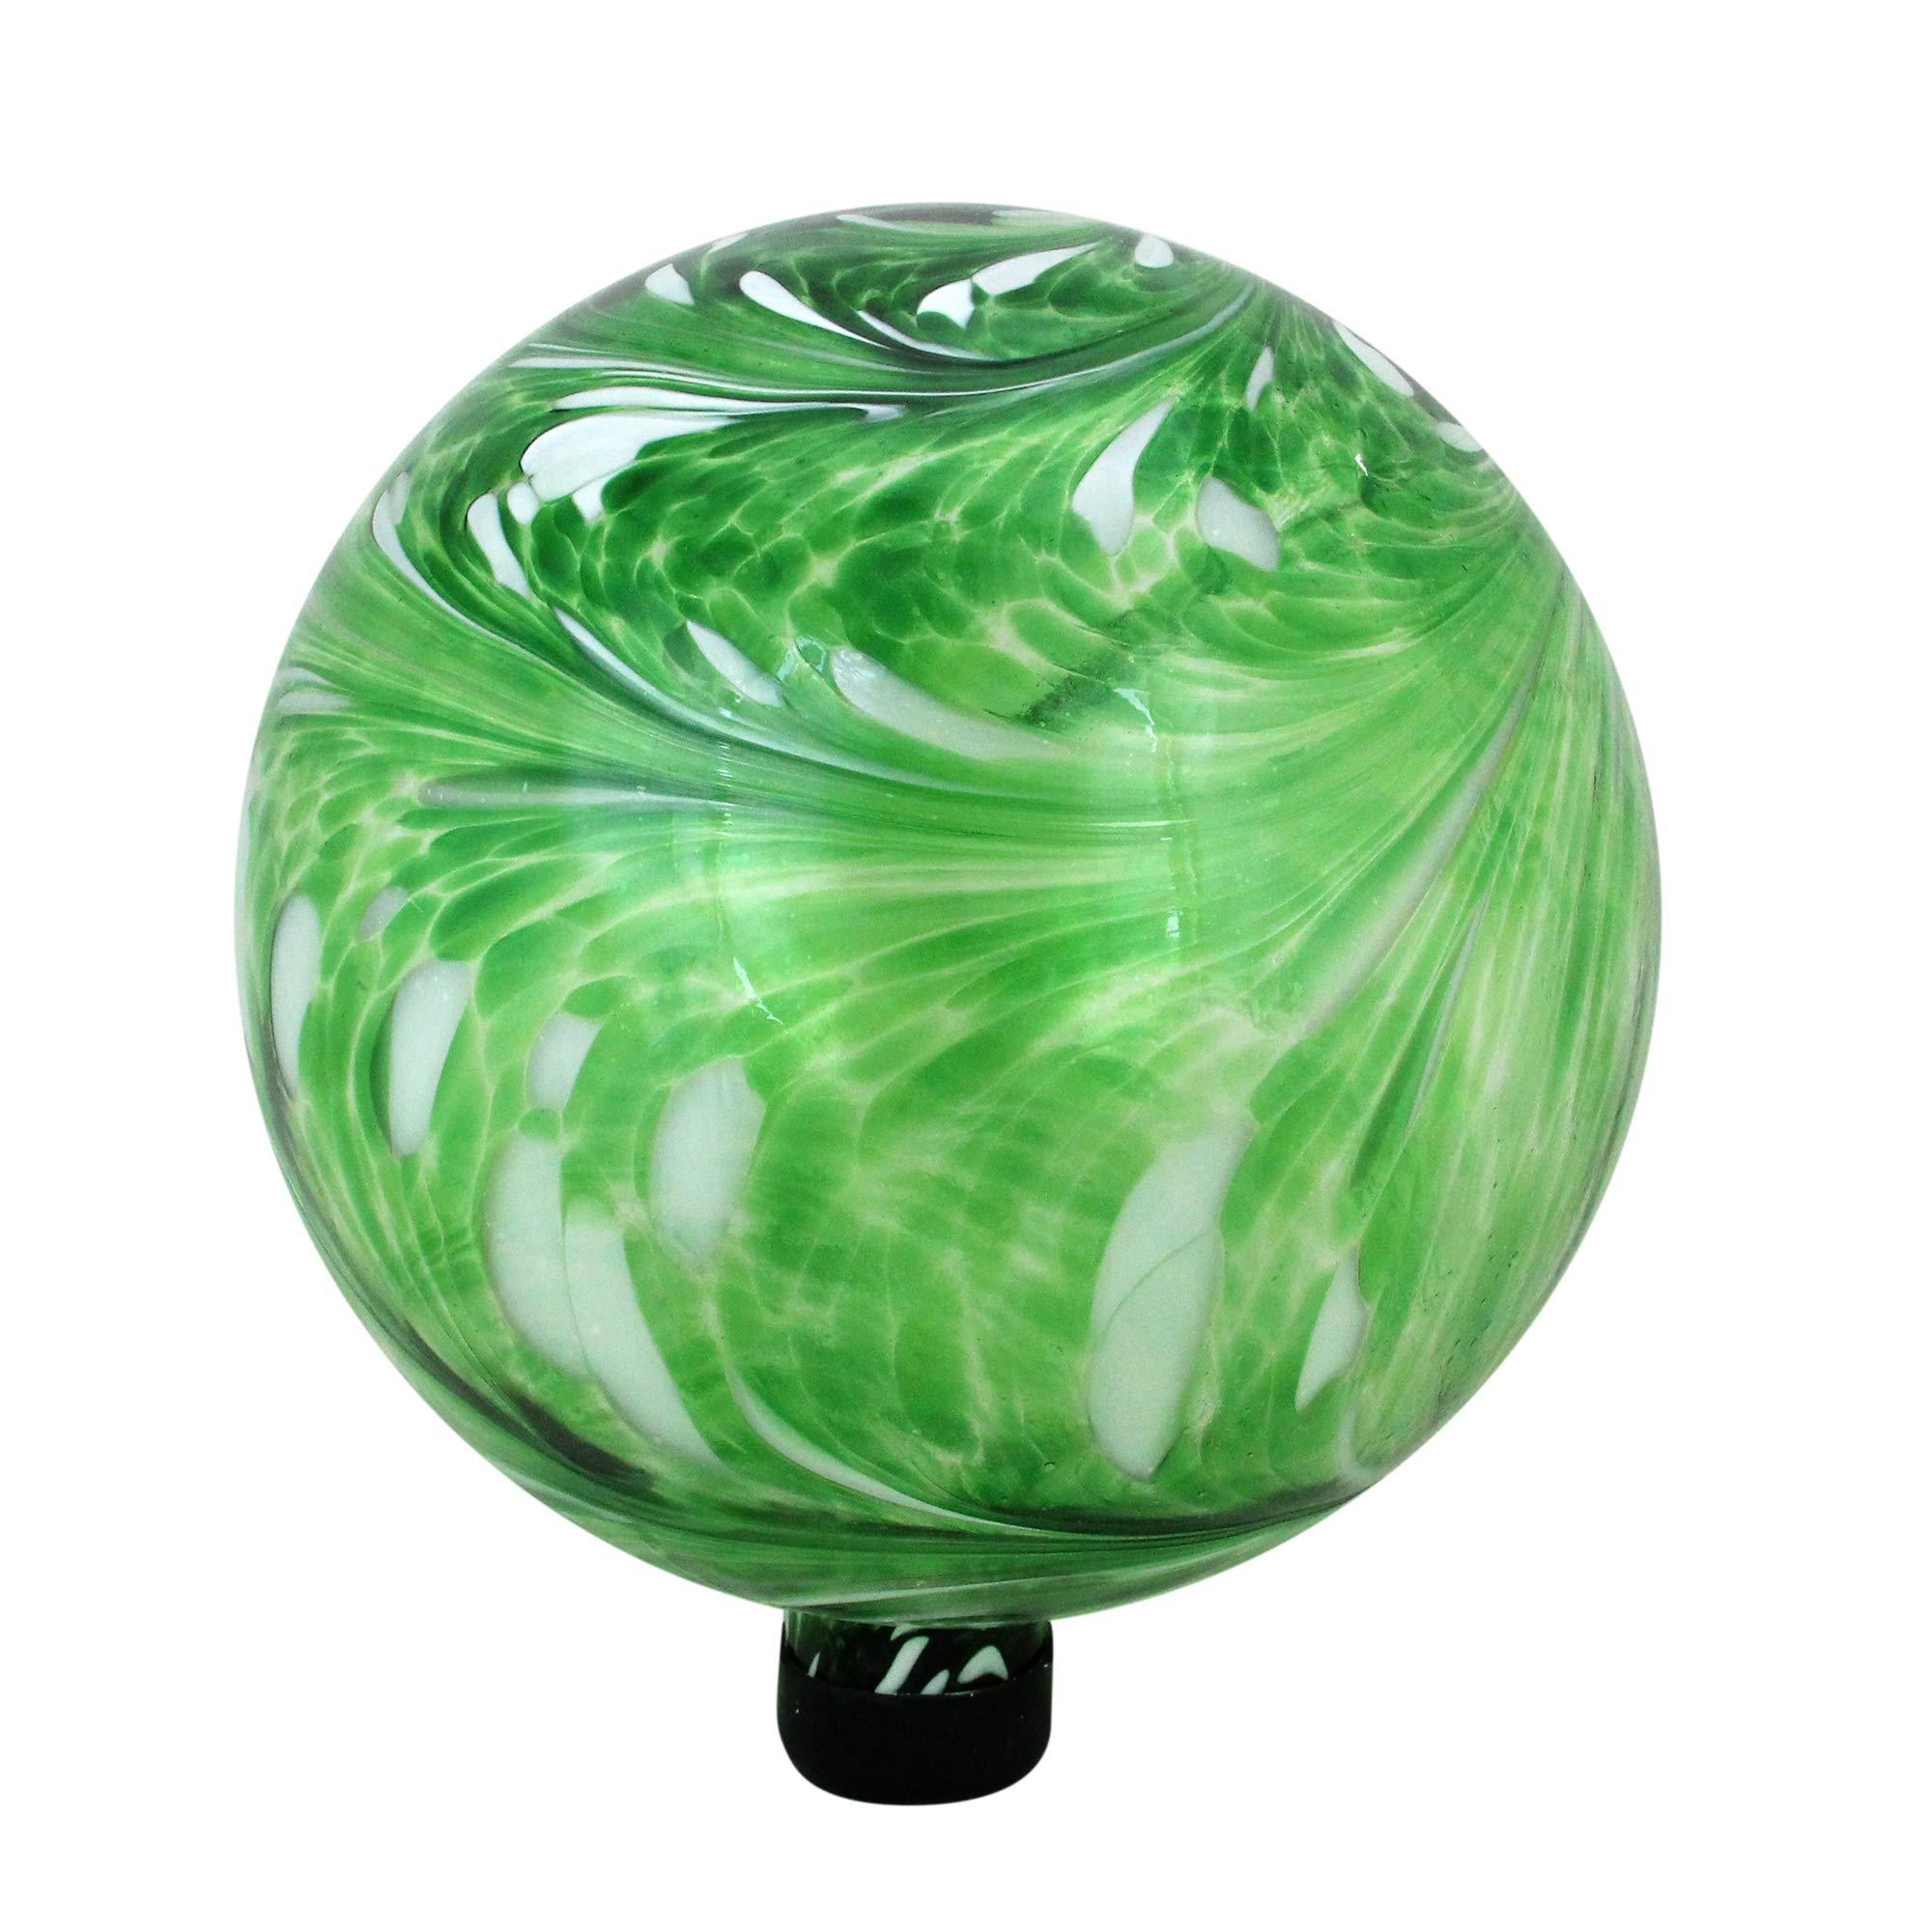 Northlight 10'' Green and White Swirl Designed Outdoor Patio Garden Gazing Ball